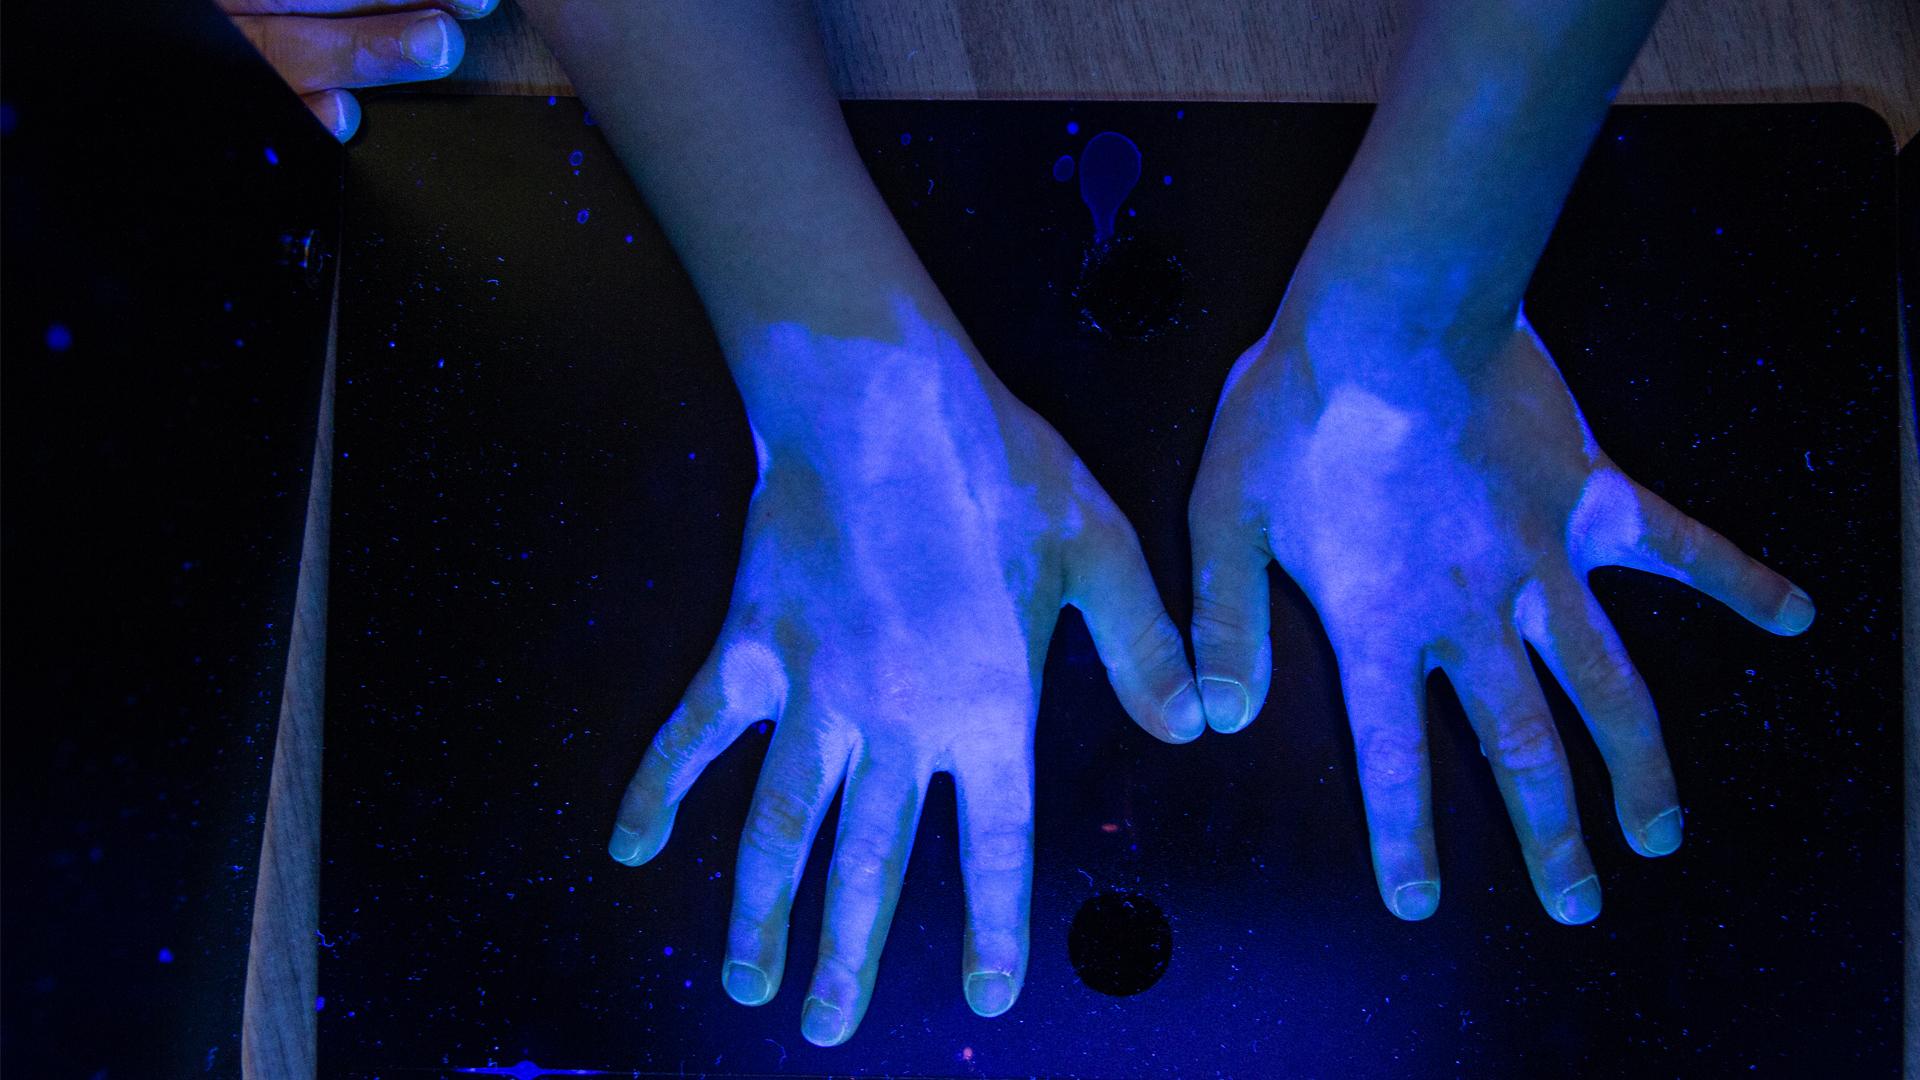 Bacteria seen in UV Light